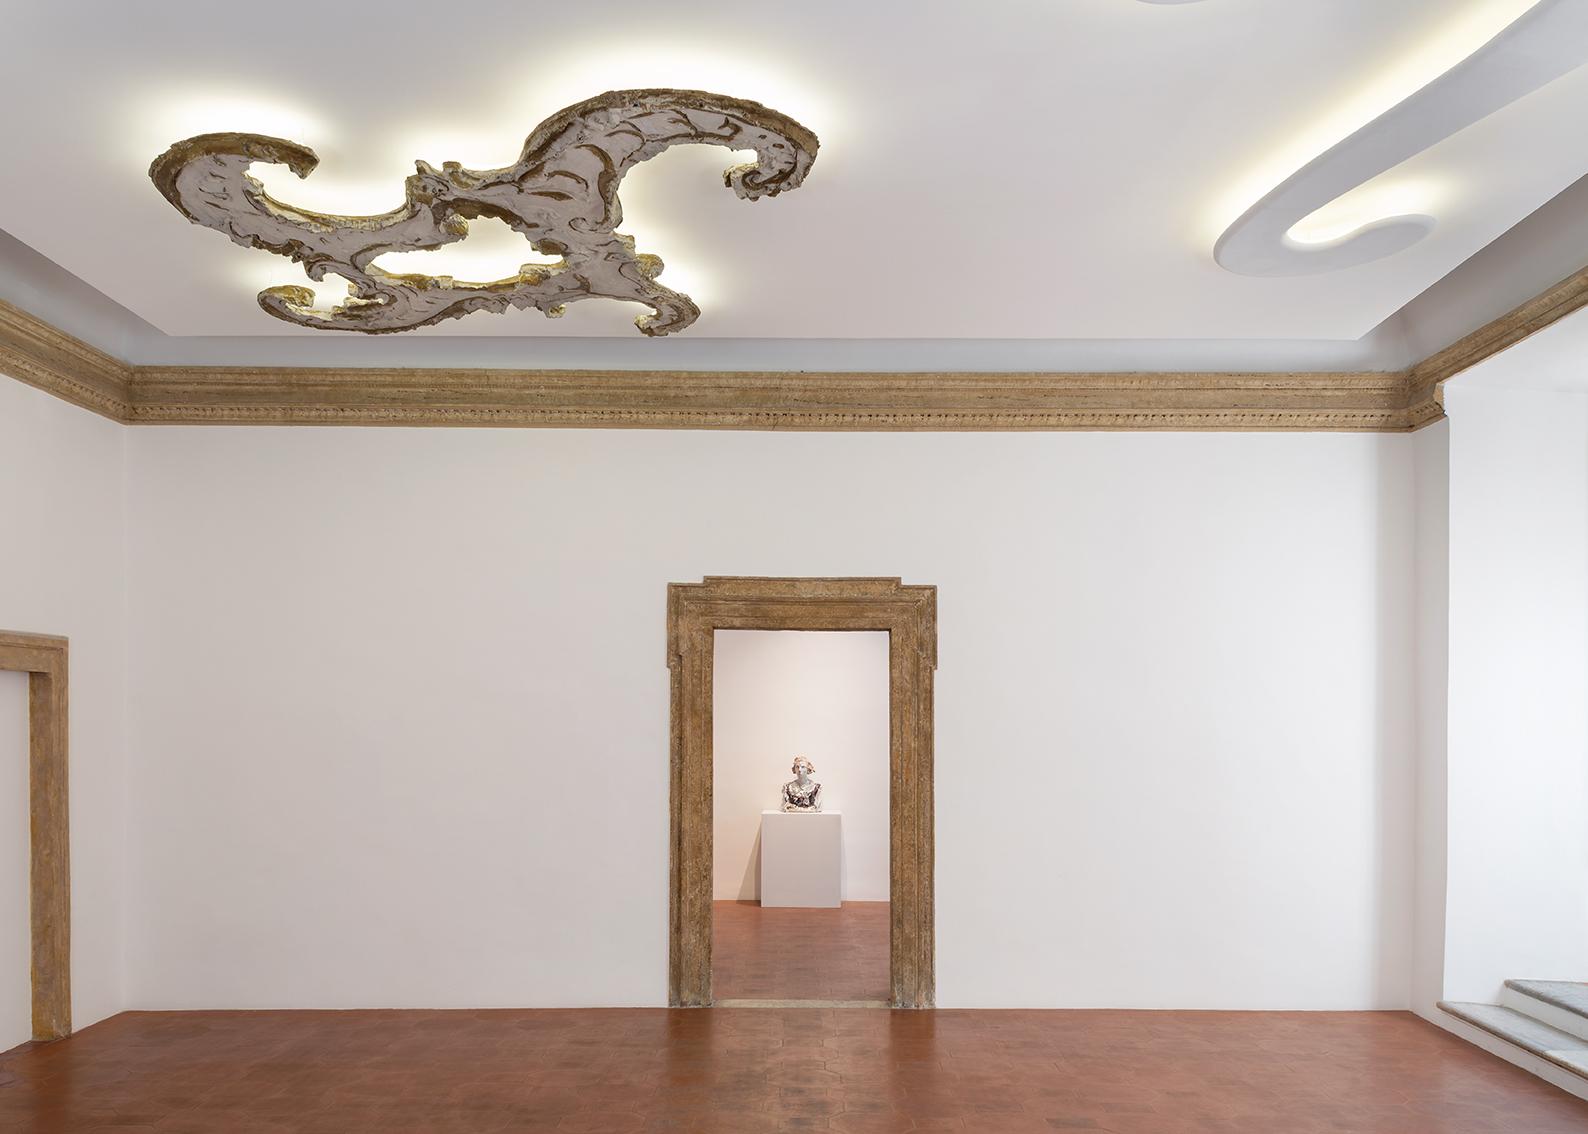 Tra barocchi e design, le creazioni di Lucio Fontana e Osvaldo Borsani in dialogo a Roma